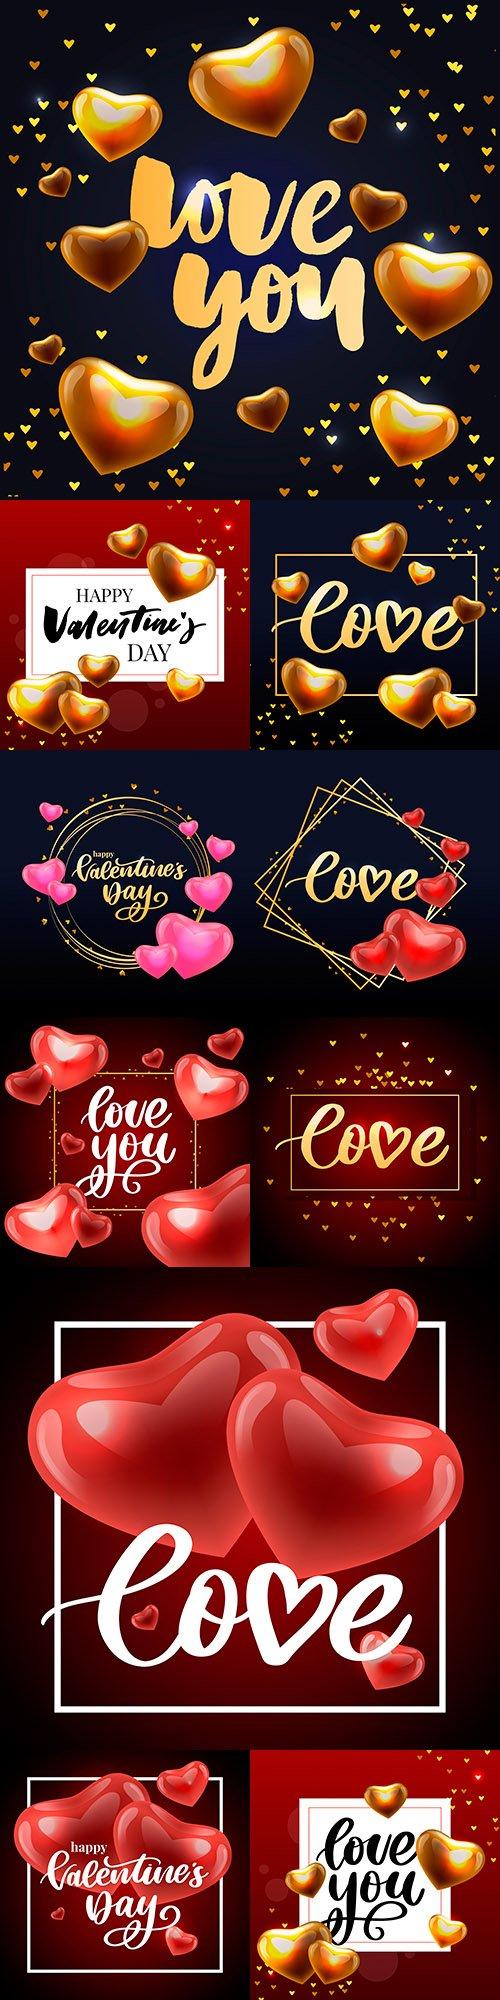 Happy Valentine's Day romantic decorative illustrations 32